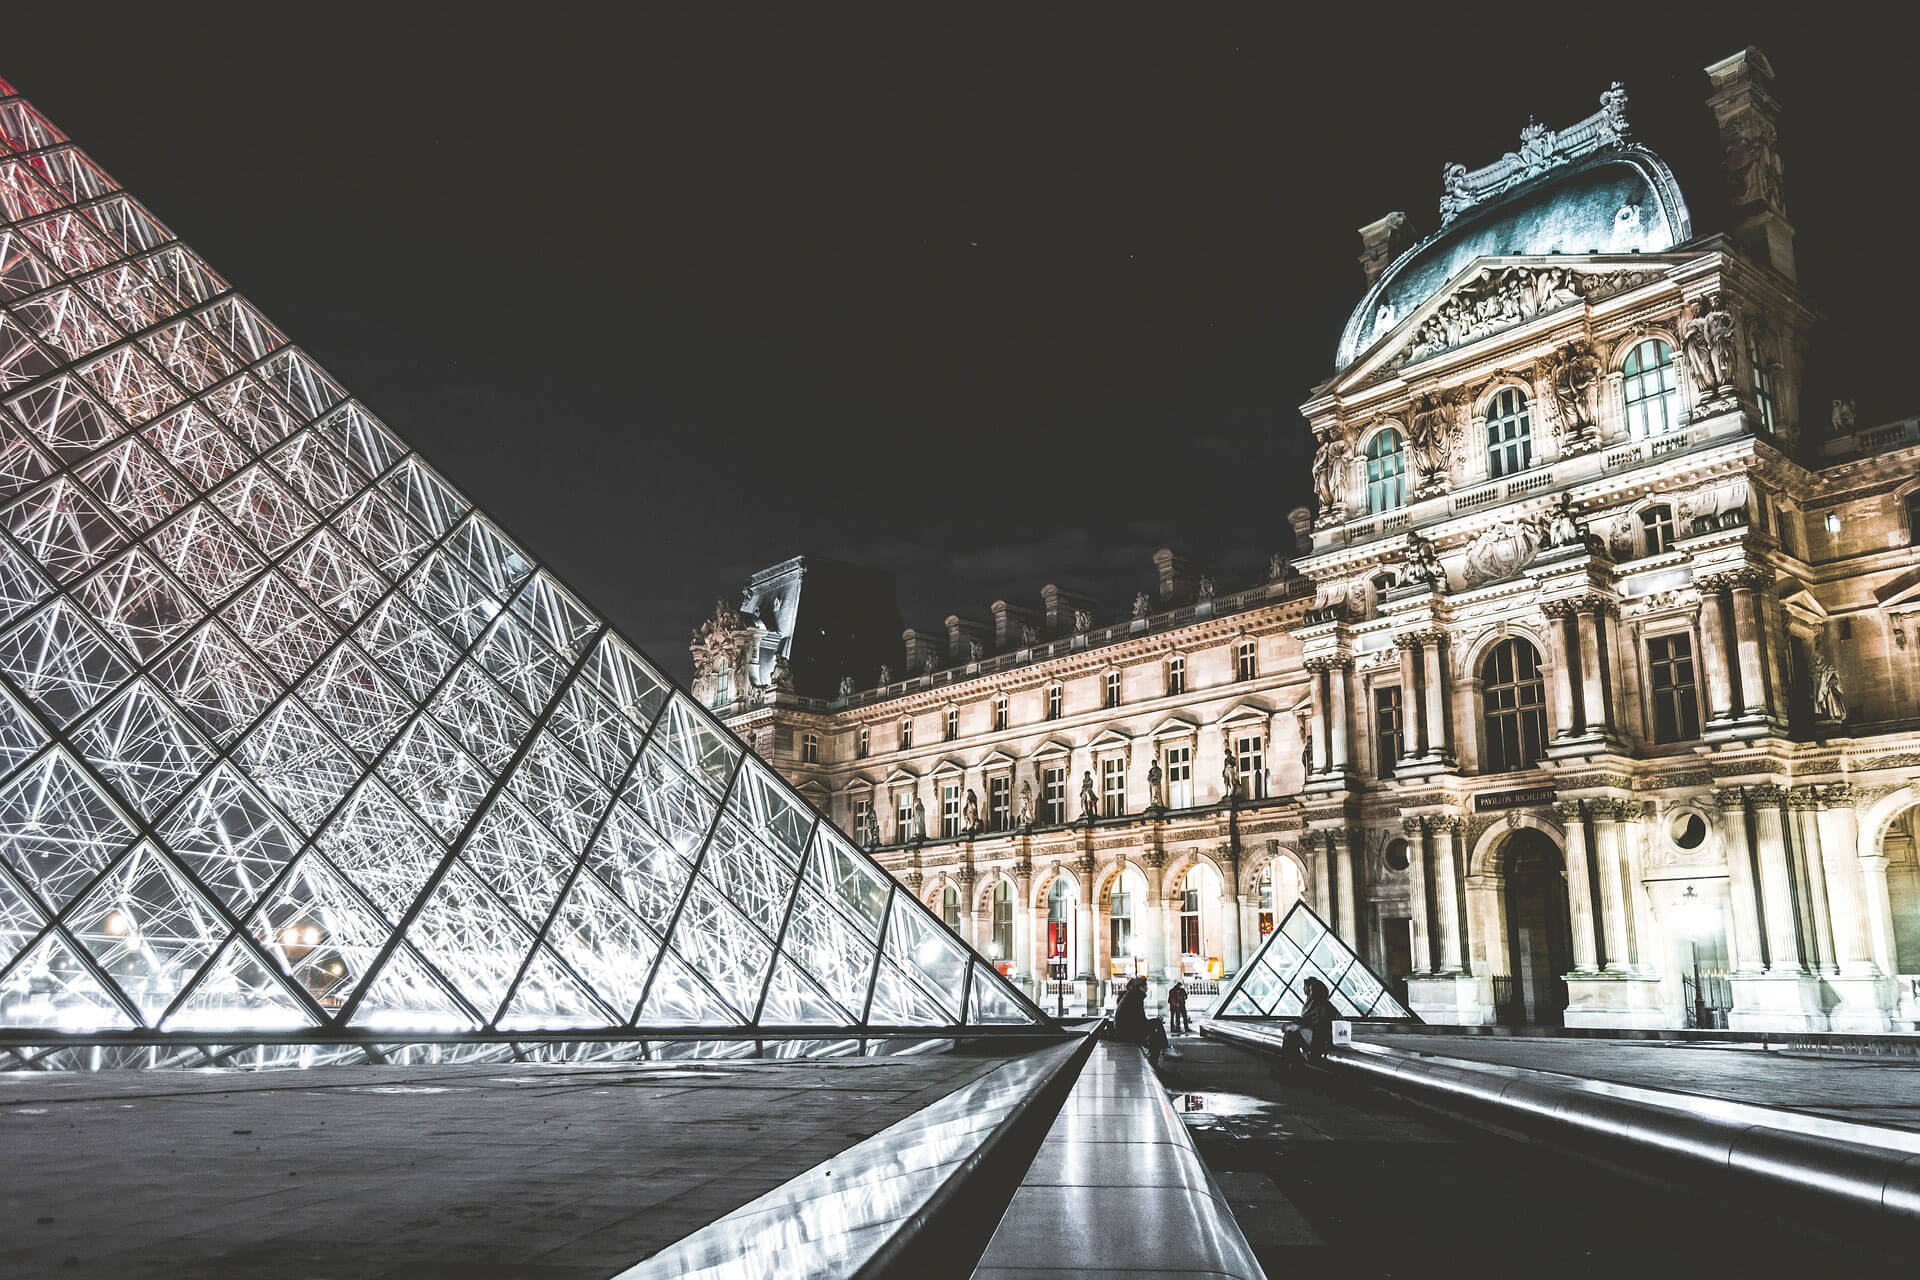 VWintage & Co | Balade Paris & Bords de Marne